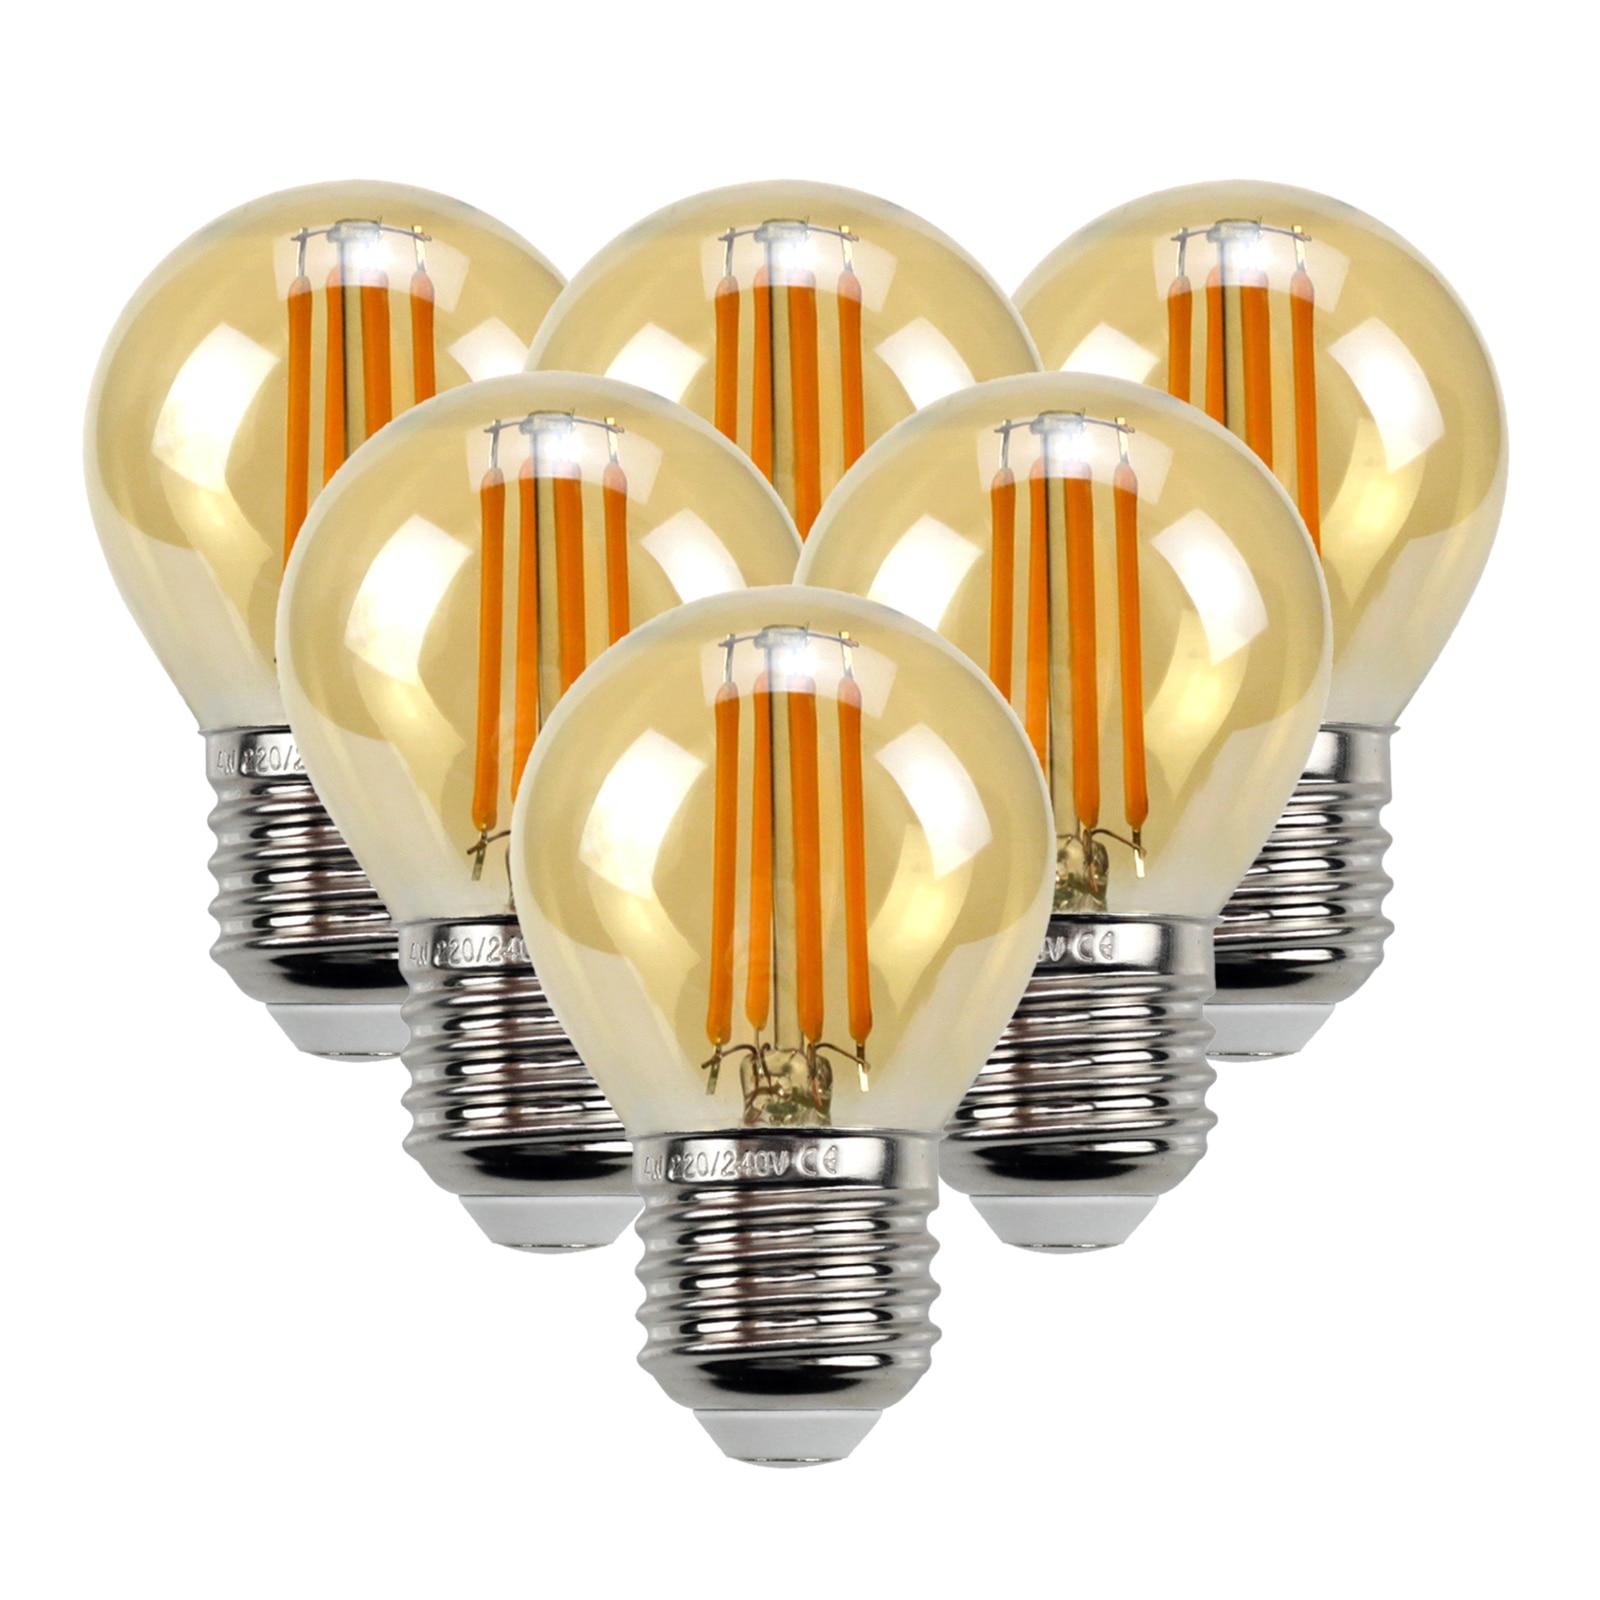 6 pçs edison lâmpadas branco quente 4w